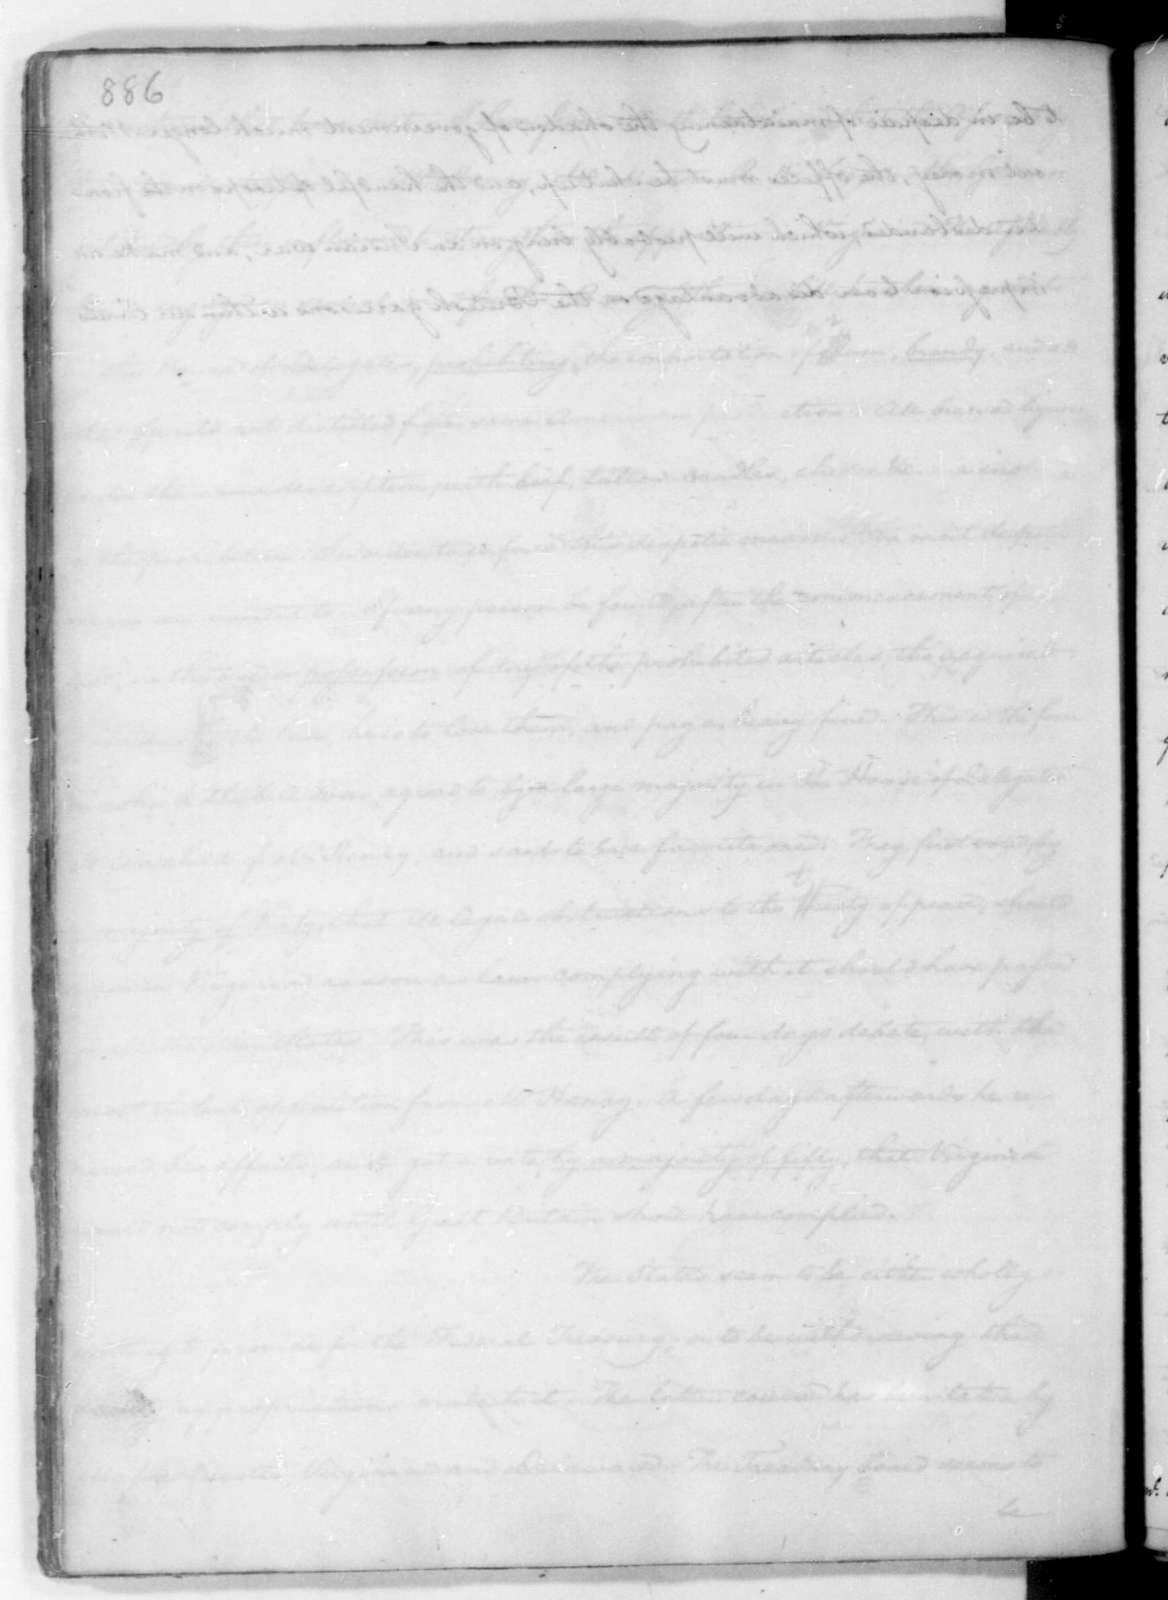 James Madison to Thomas Jefferson, December 20, 1787.